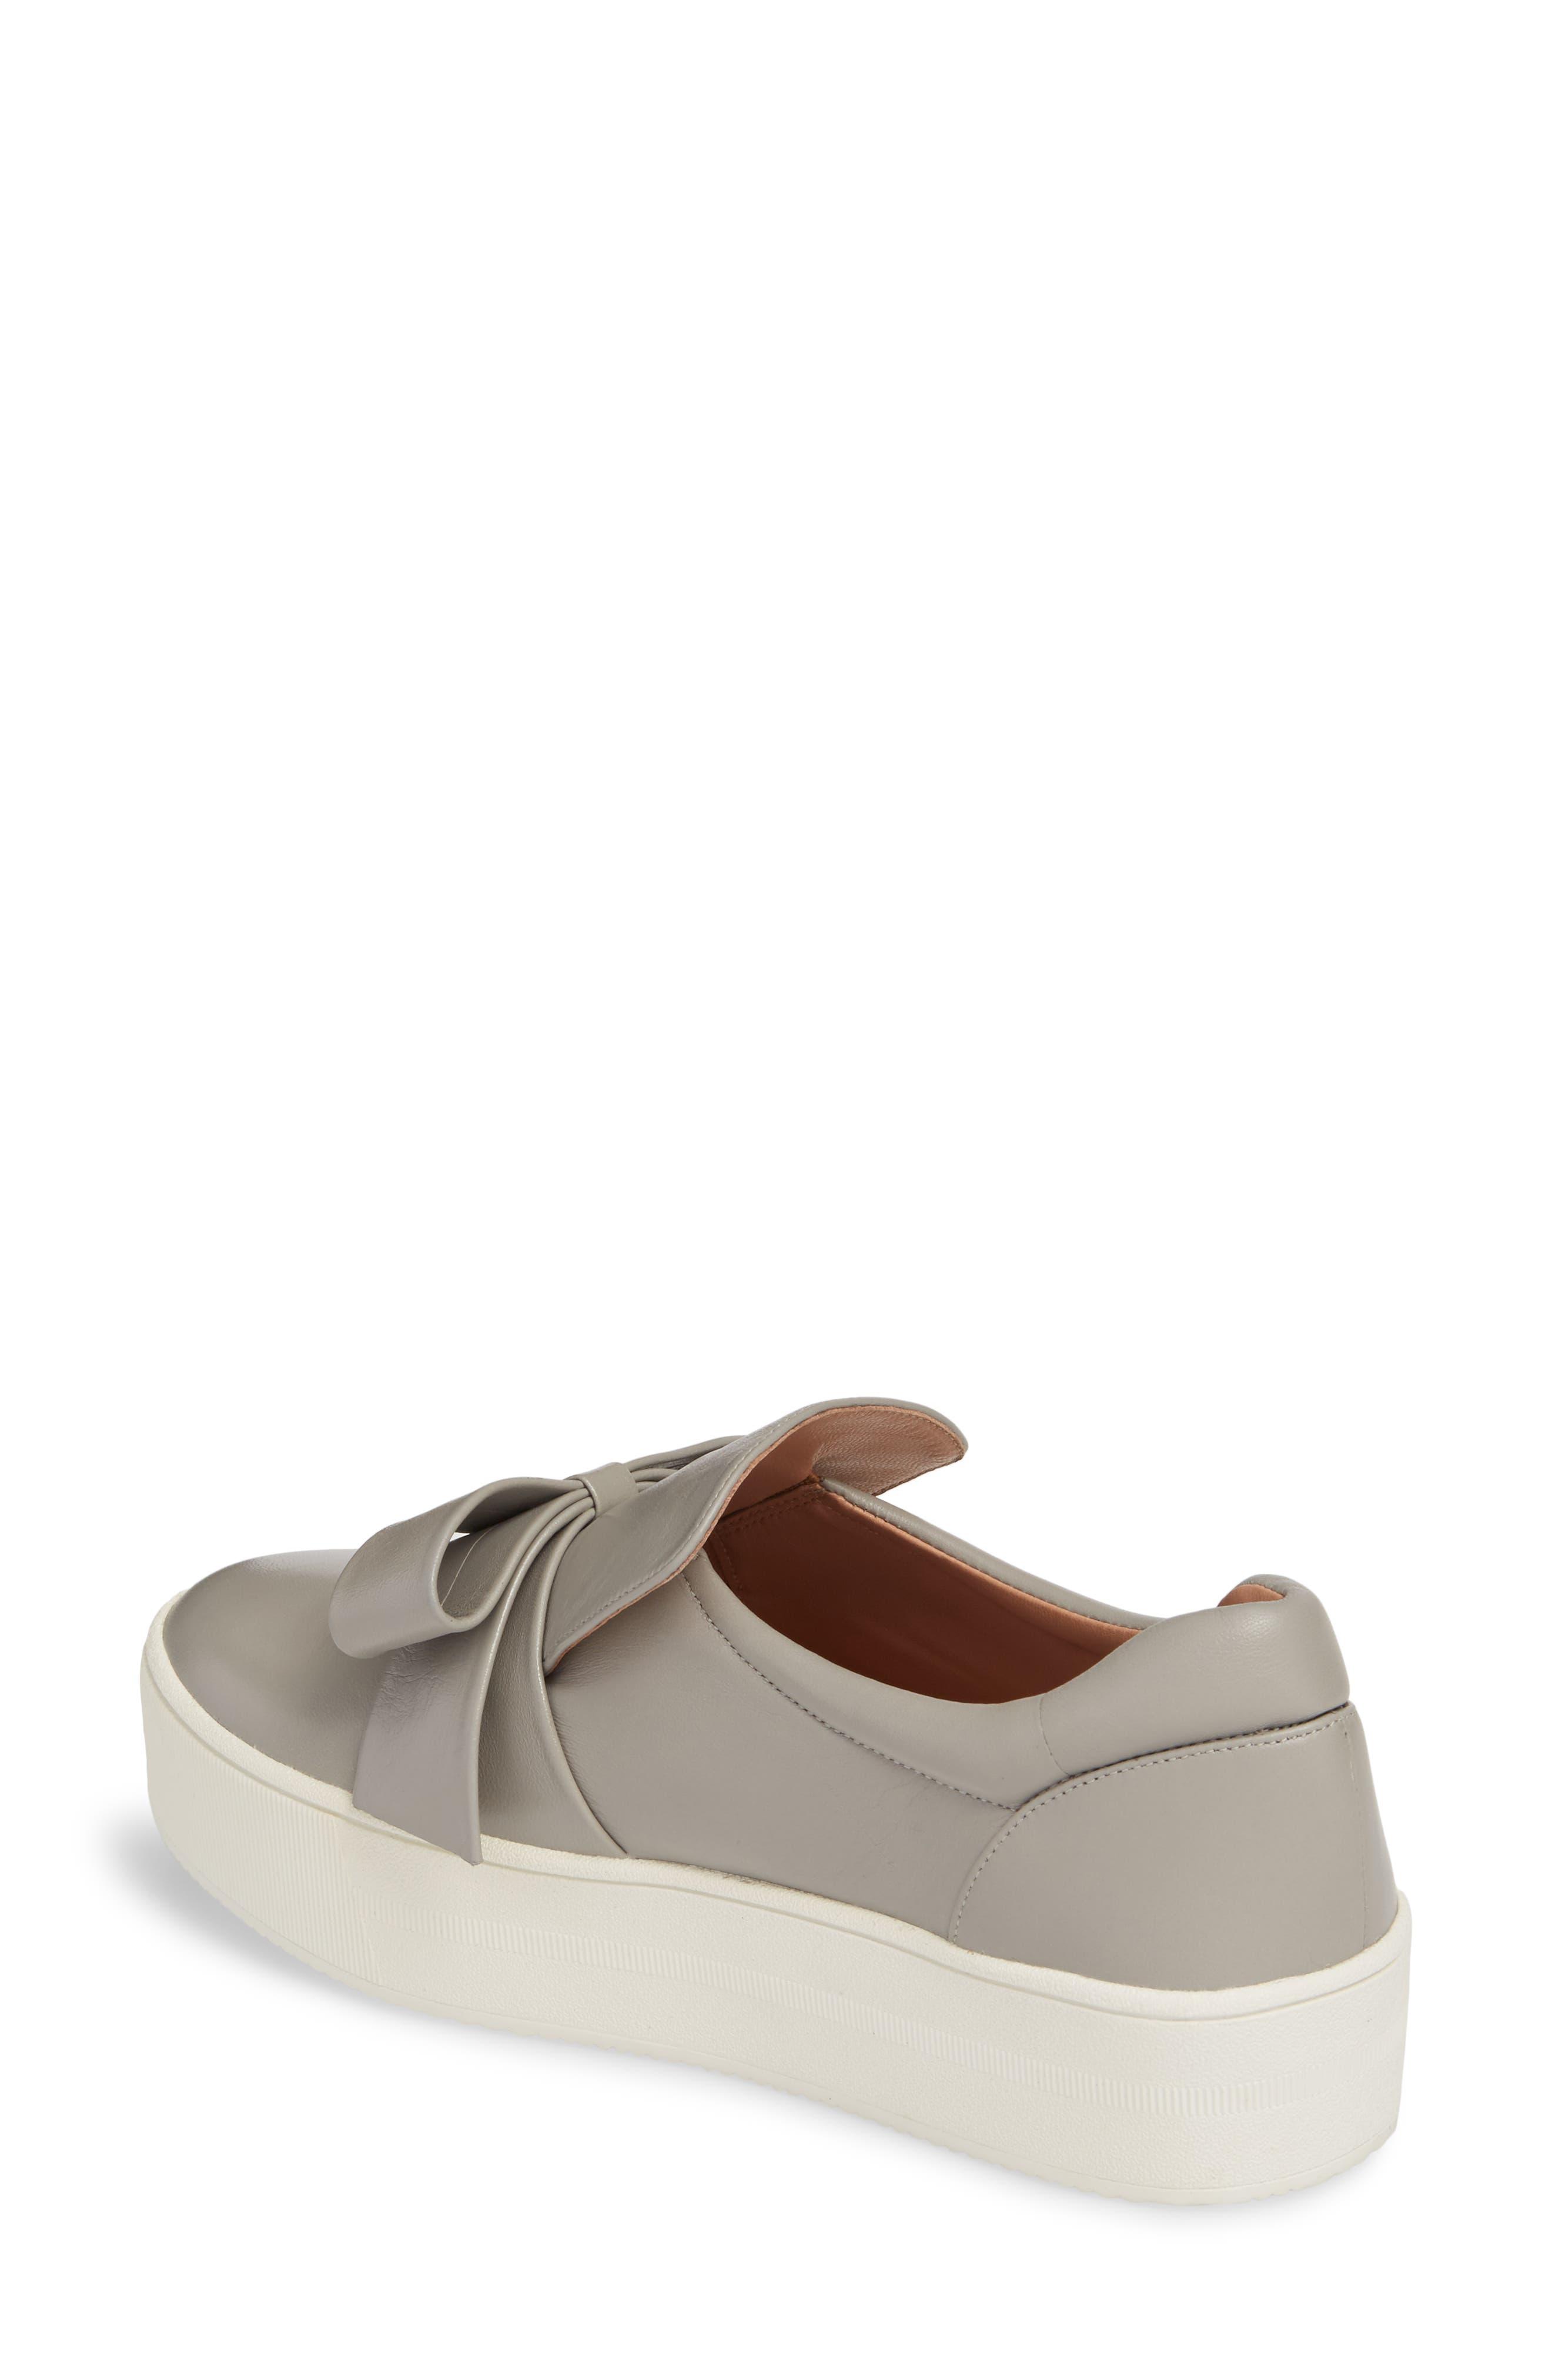 Vania Bow Platform Sneaker,                             Alternate thumbnail 4, color,